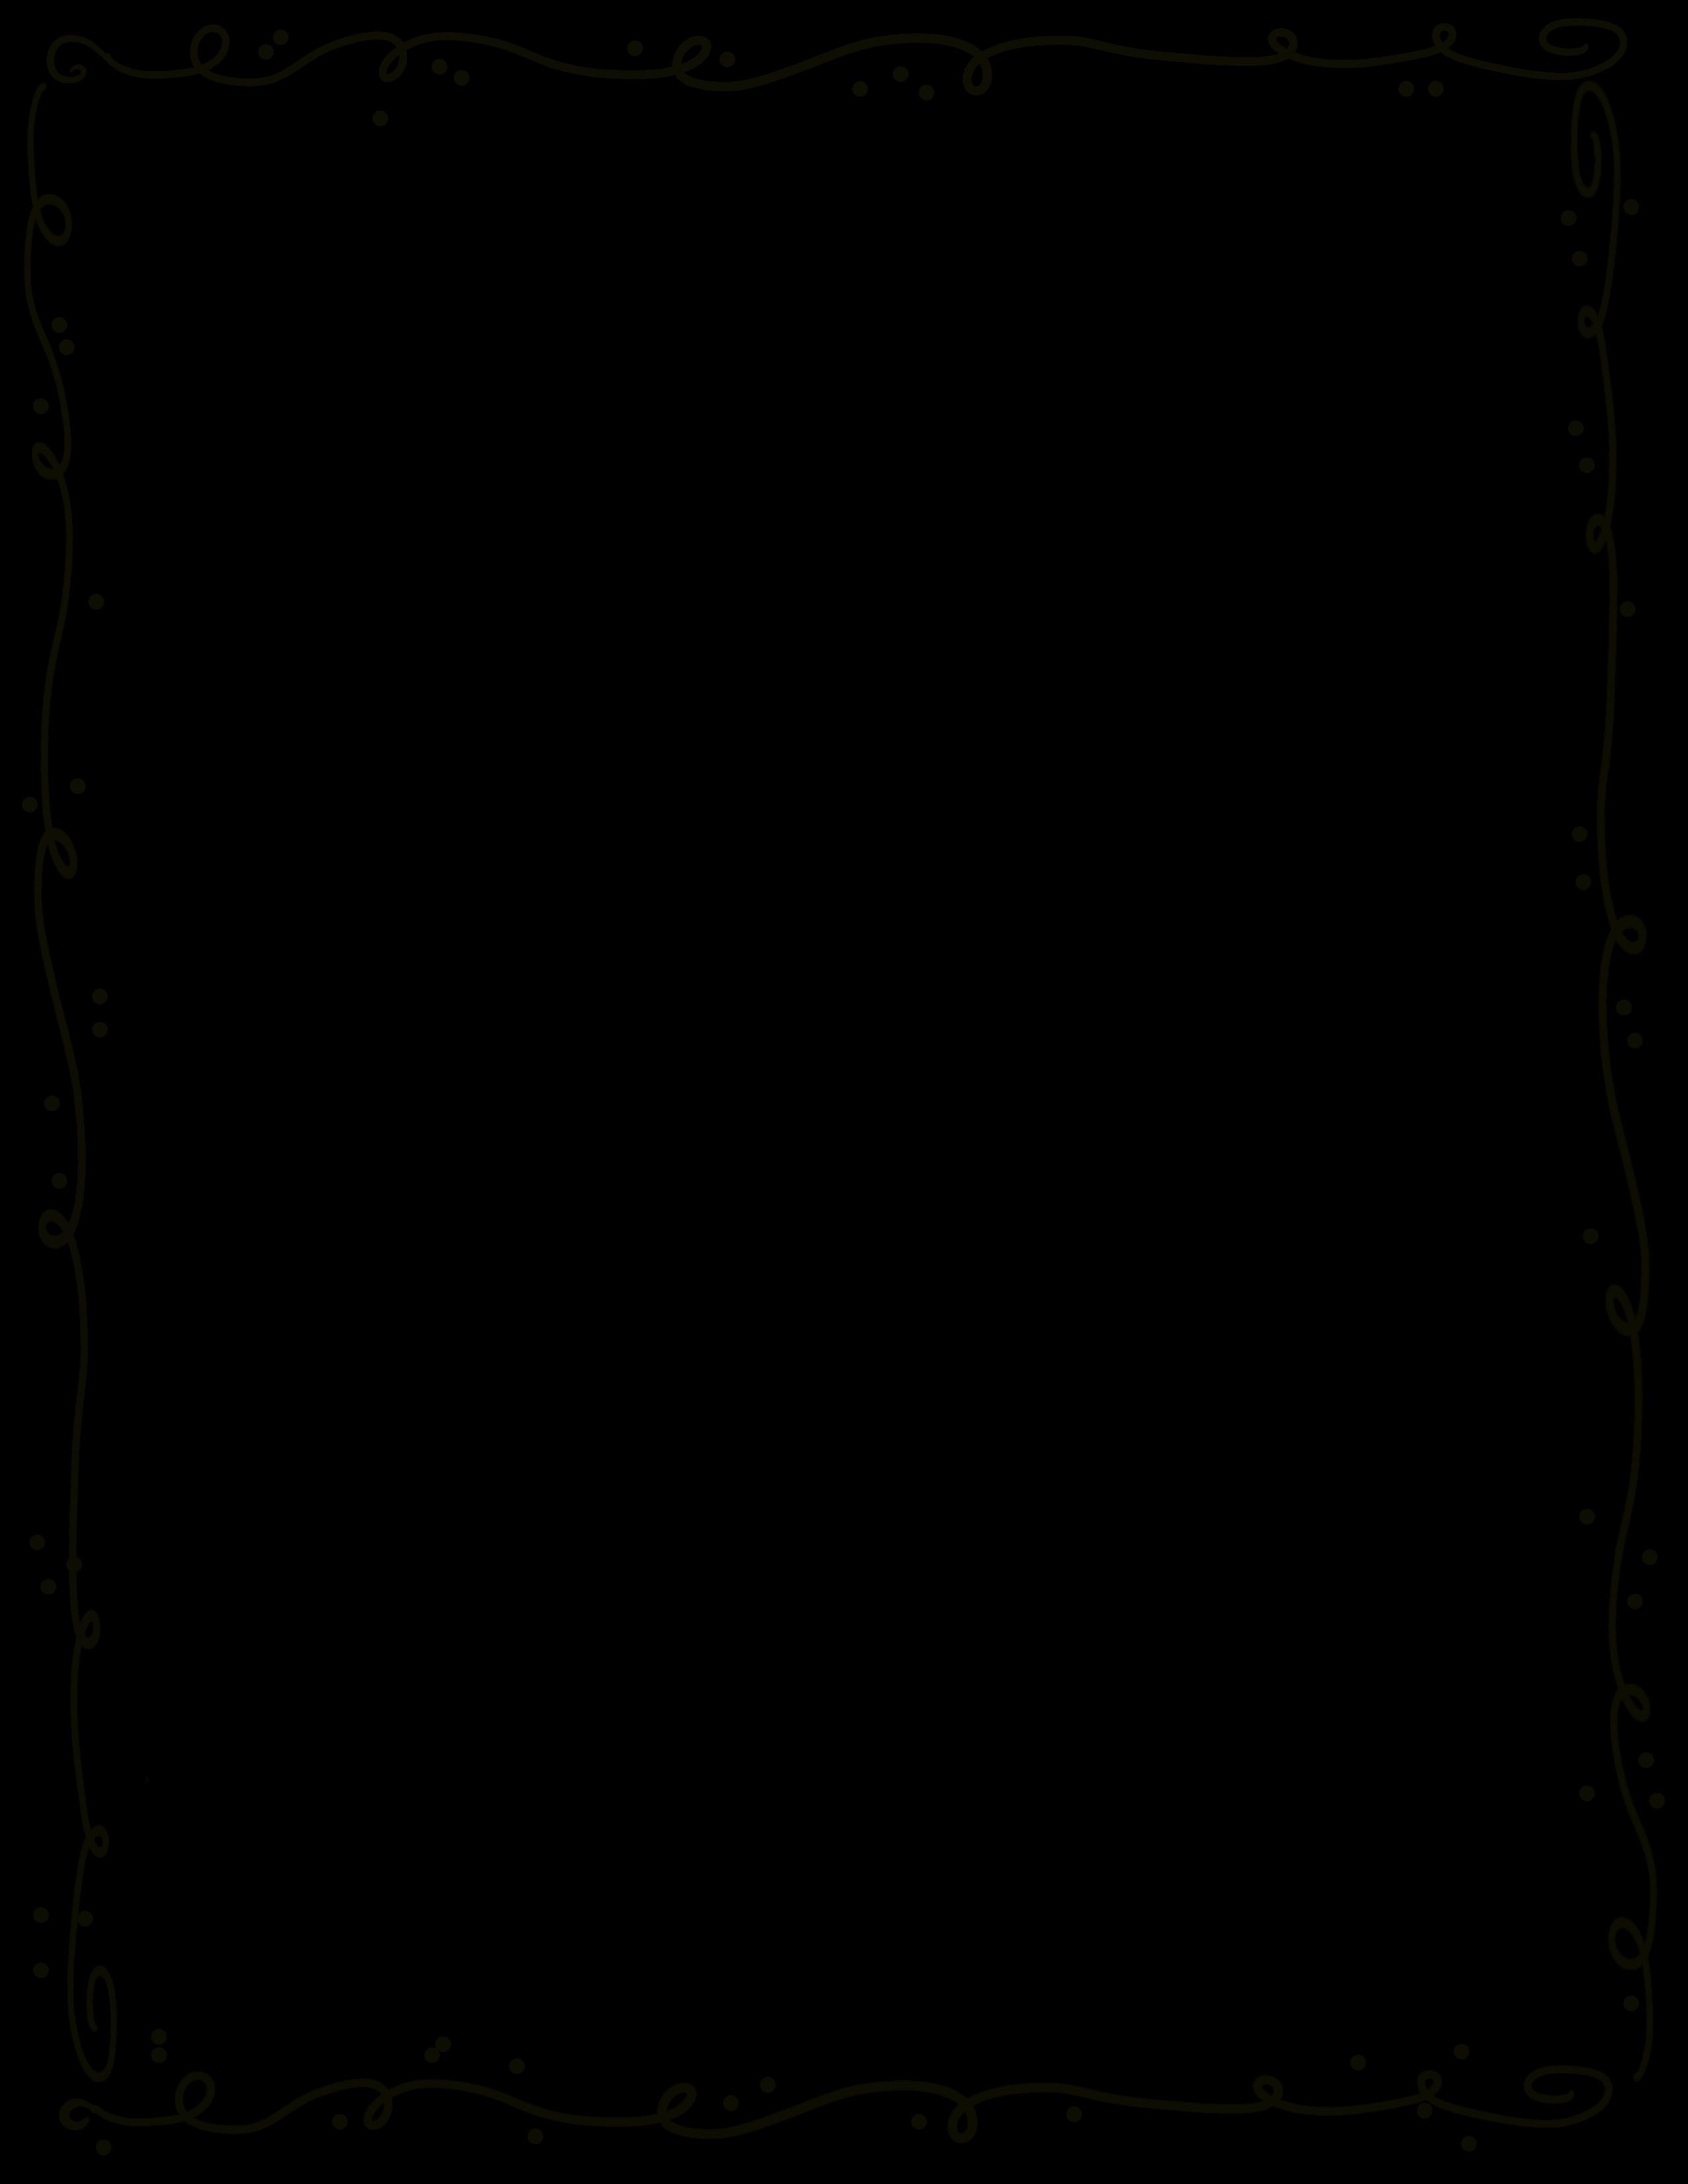 Pin De Klevis Em Marcs I Vores Molduras Bonitas Bordas Para Textos Bordas